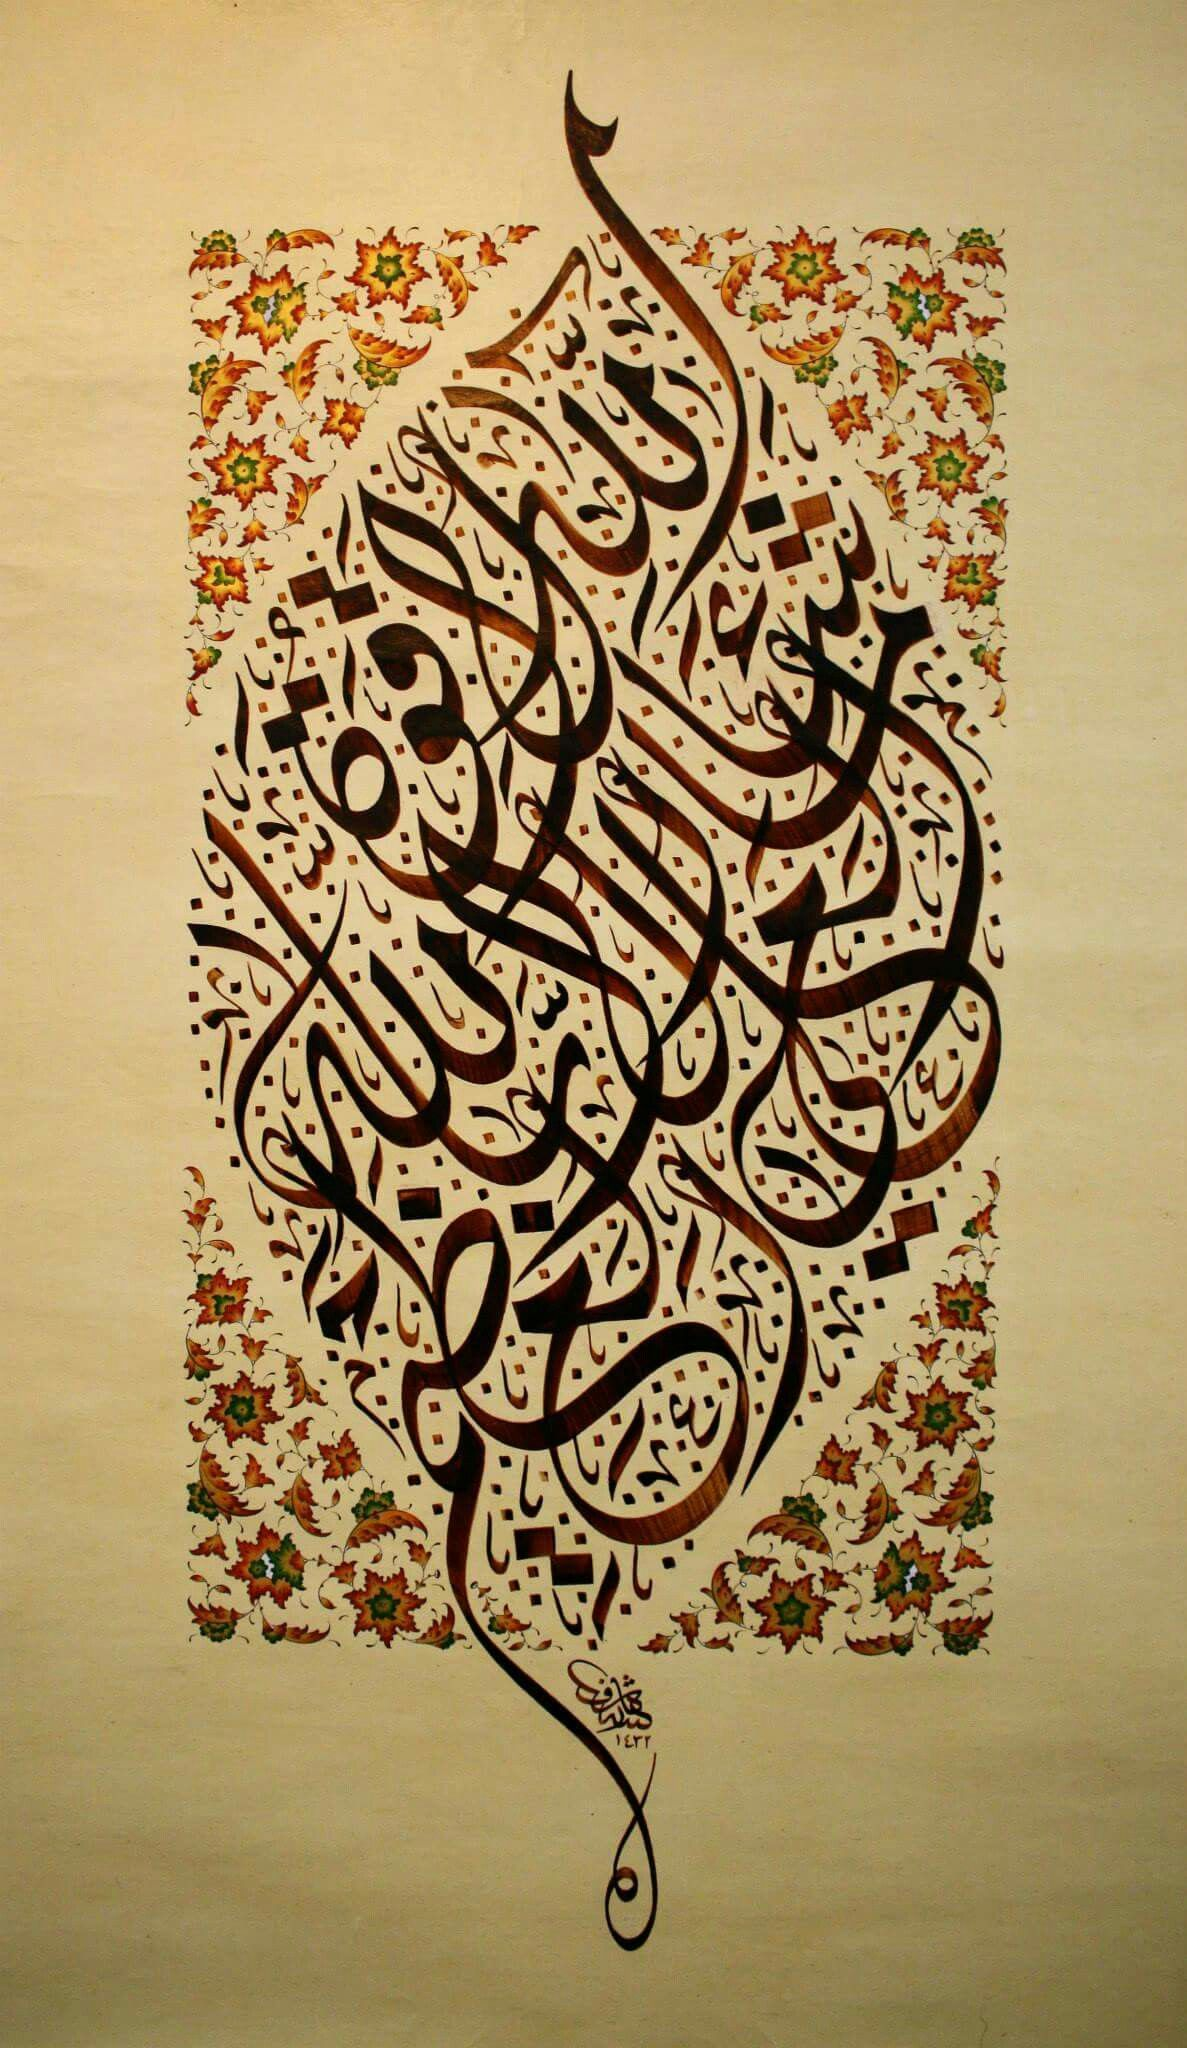 Pin By Badar Akmal On Arabic Calligraphy - Pinterest -